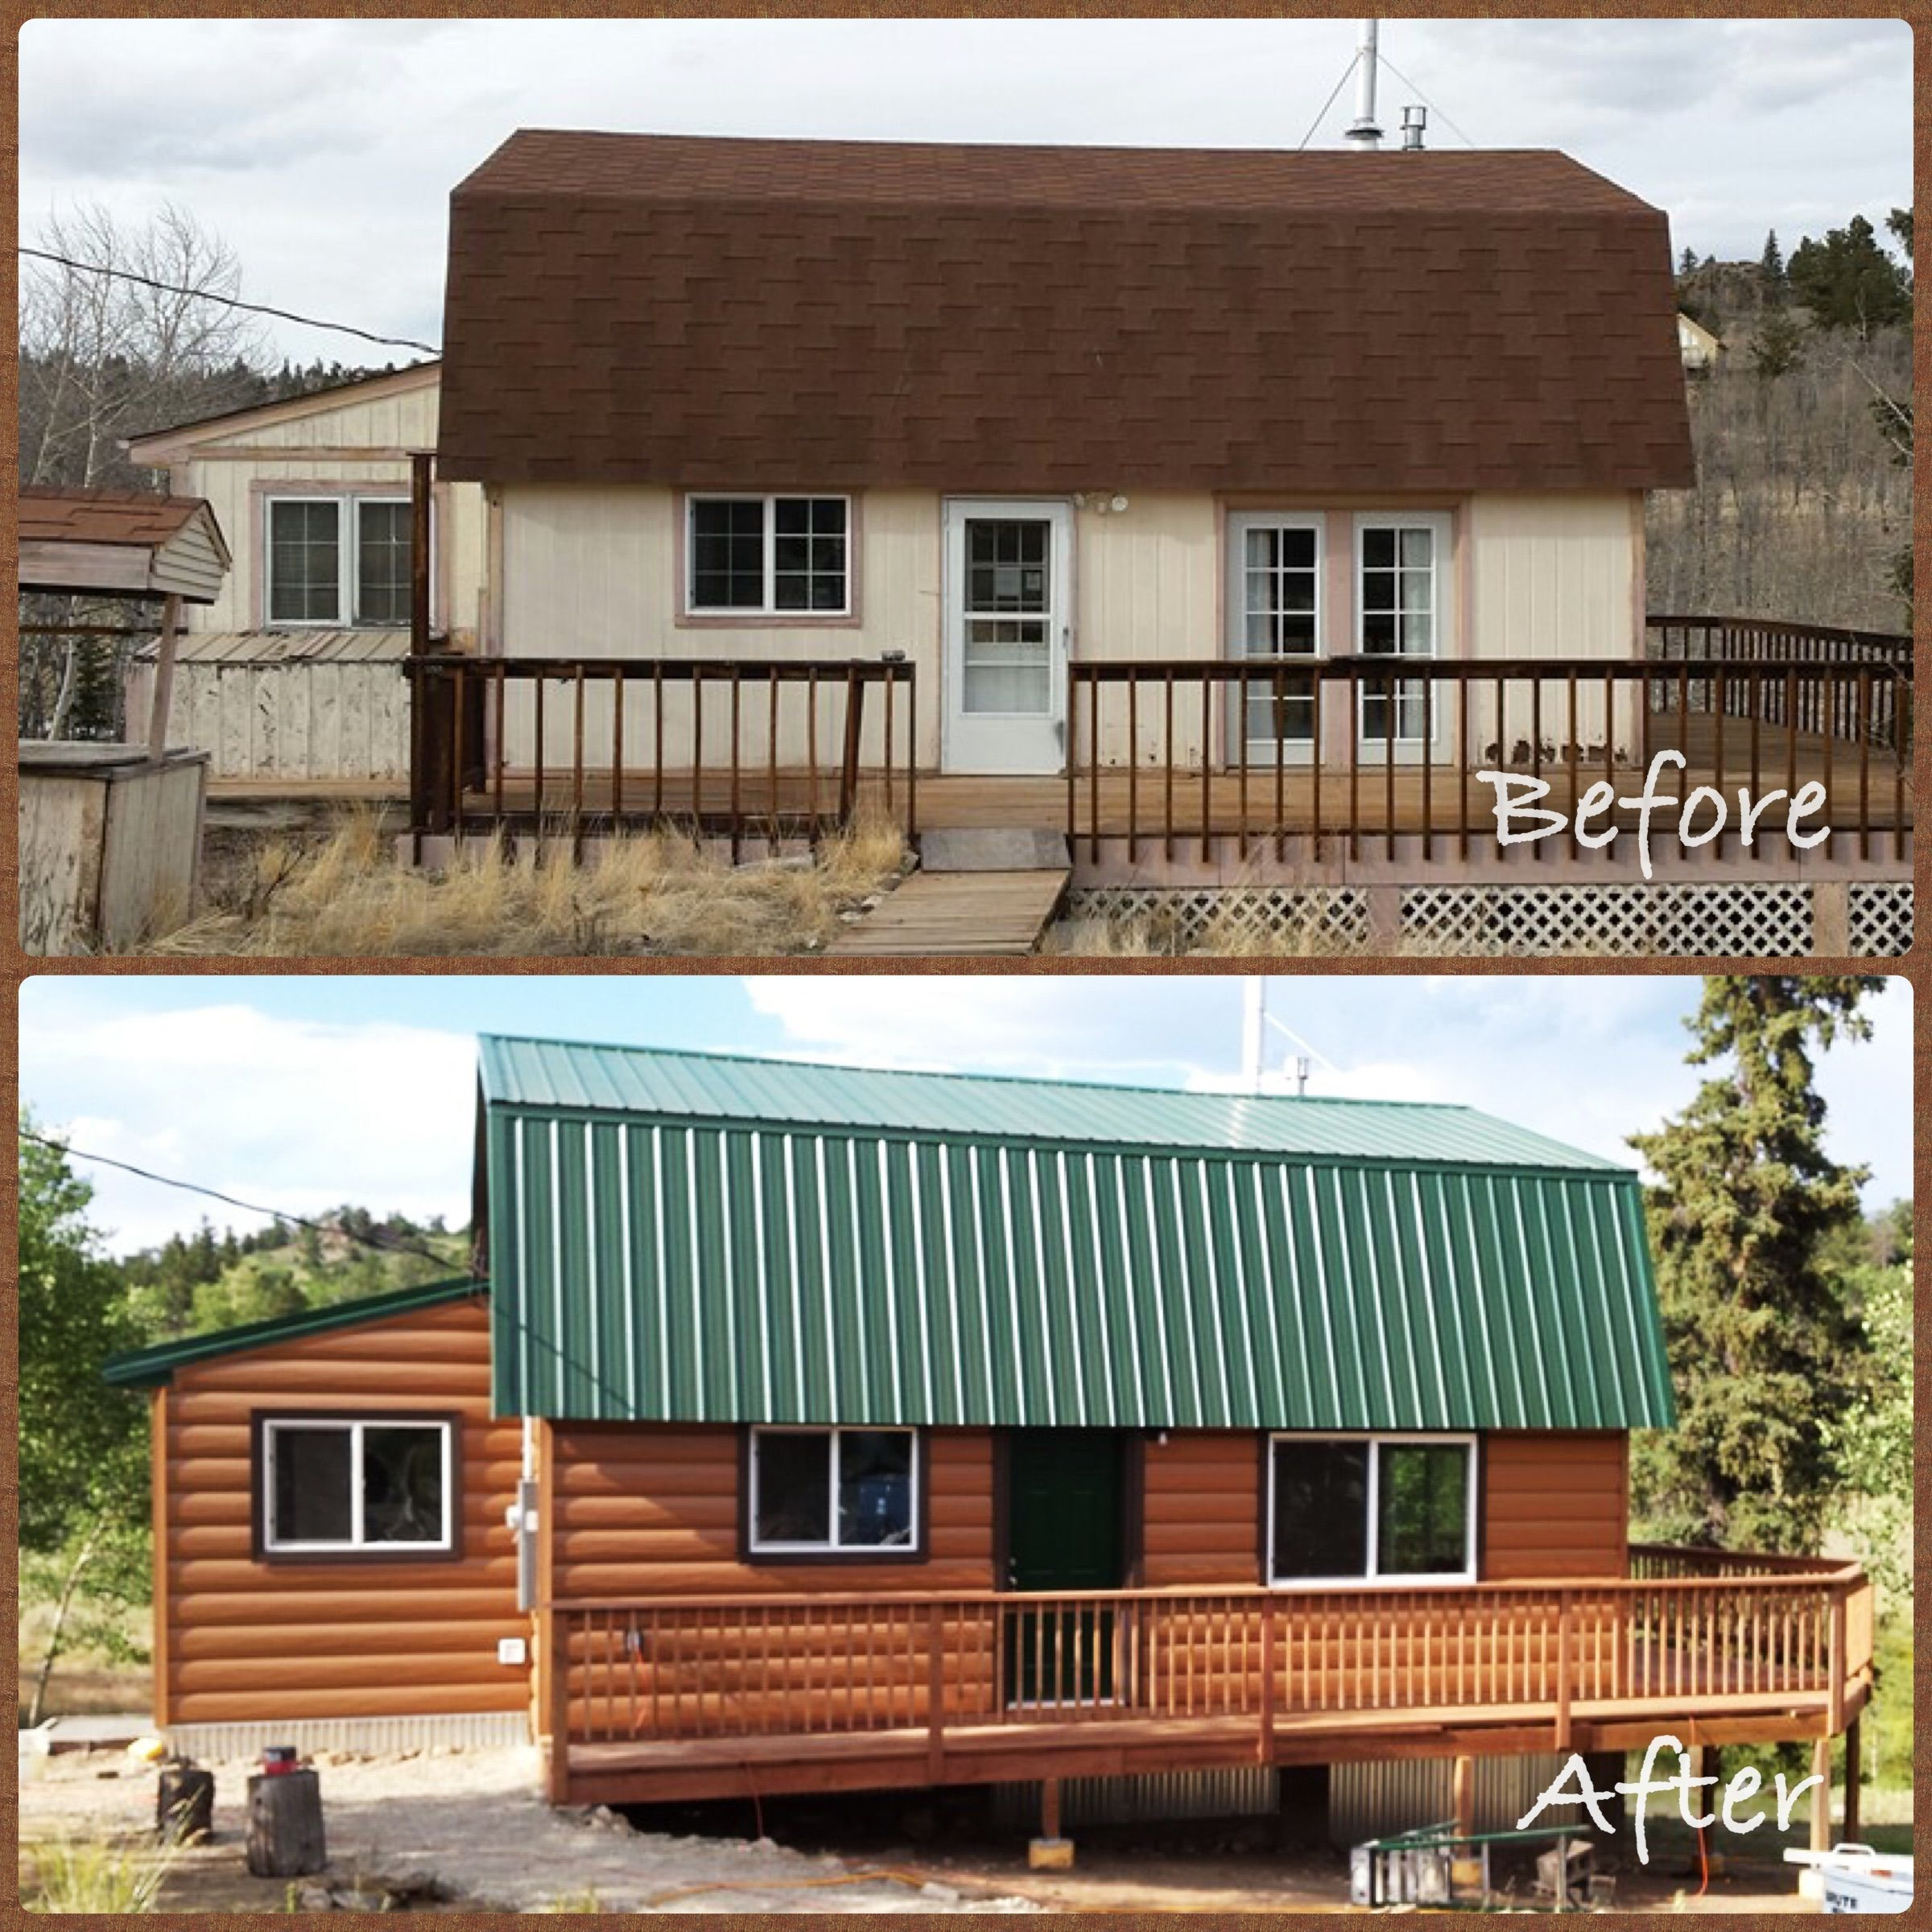 Www Lakecountrylog Com Custom Handcrafted Stacked Log Home With Custom Shiplap Log Siding In The Gable Wall Log Cabin Homes Log Siding Log Homes